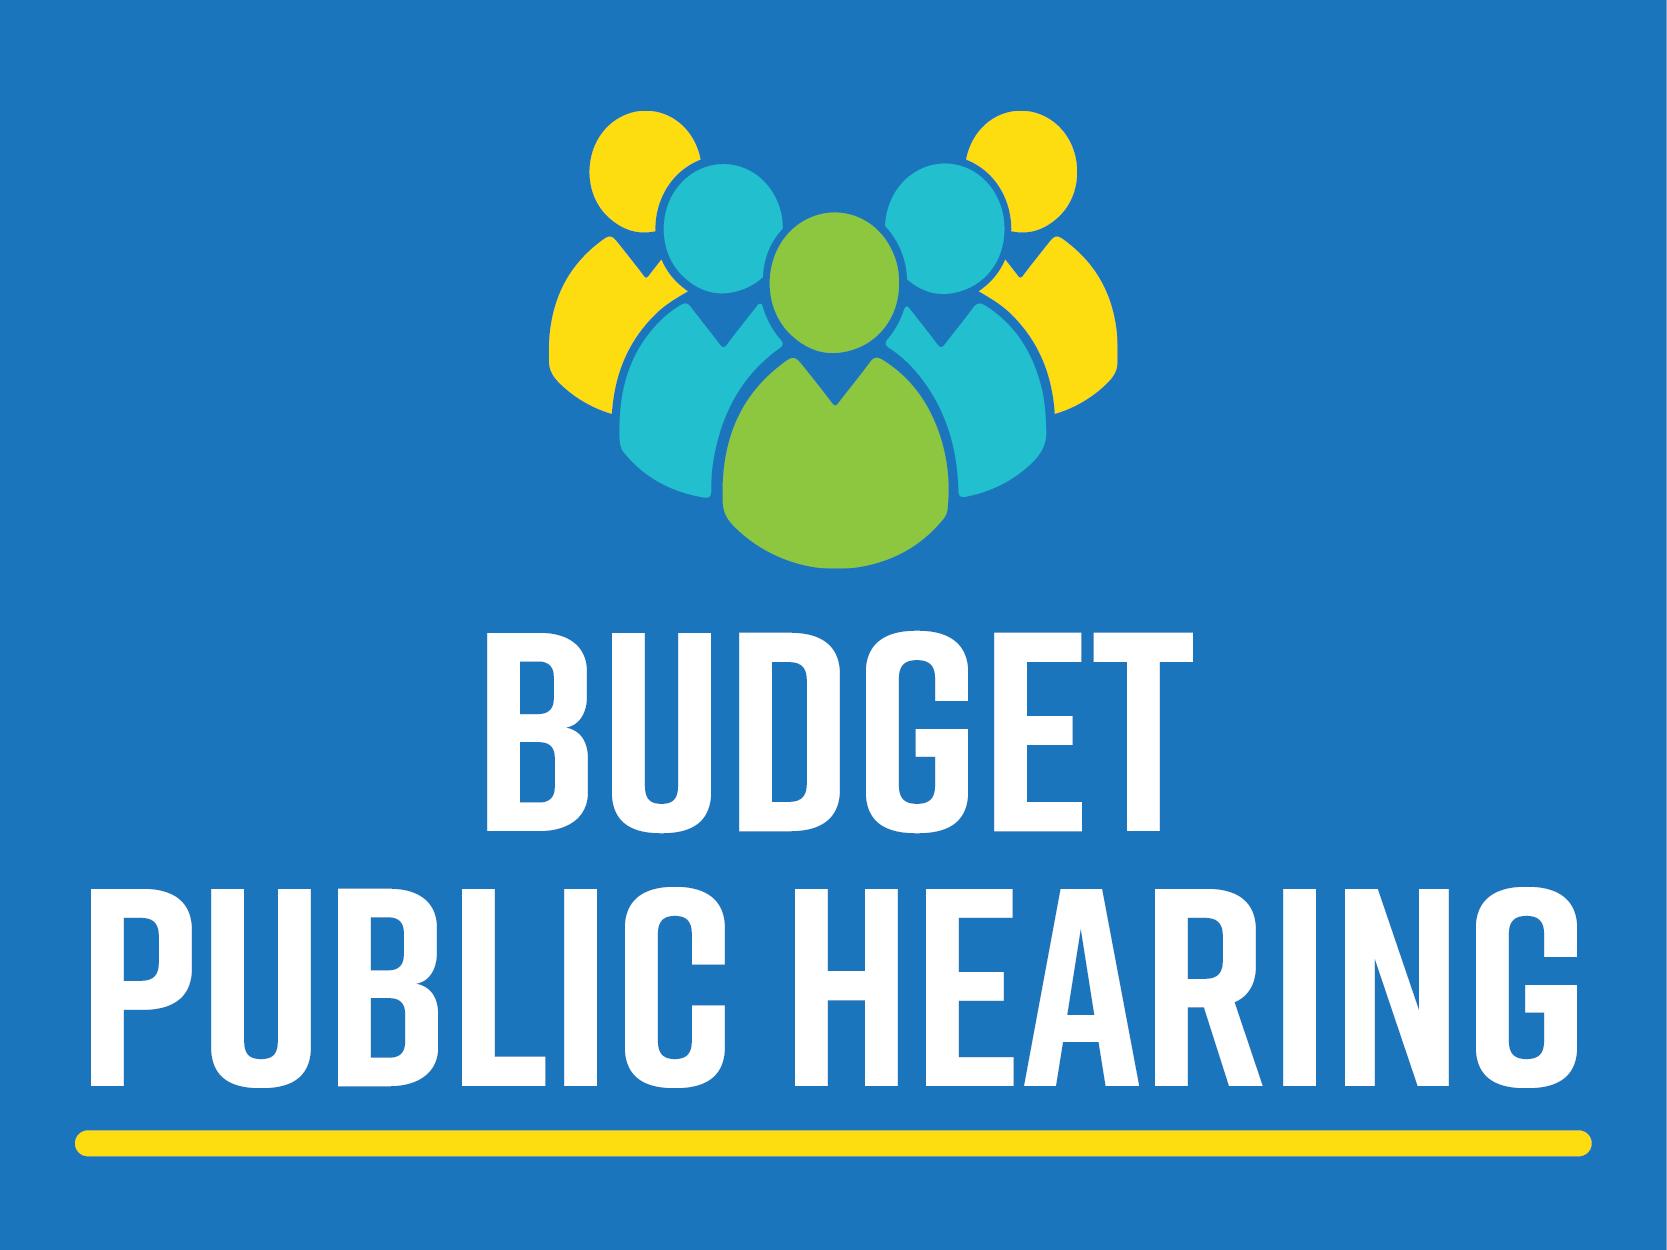 Charlotte County Fl School Calendar 2021-2022 First Budget Public Hearing | Charlotte County, FL